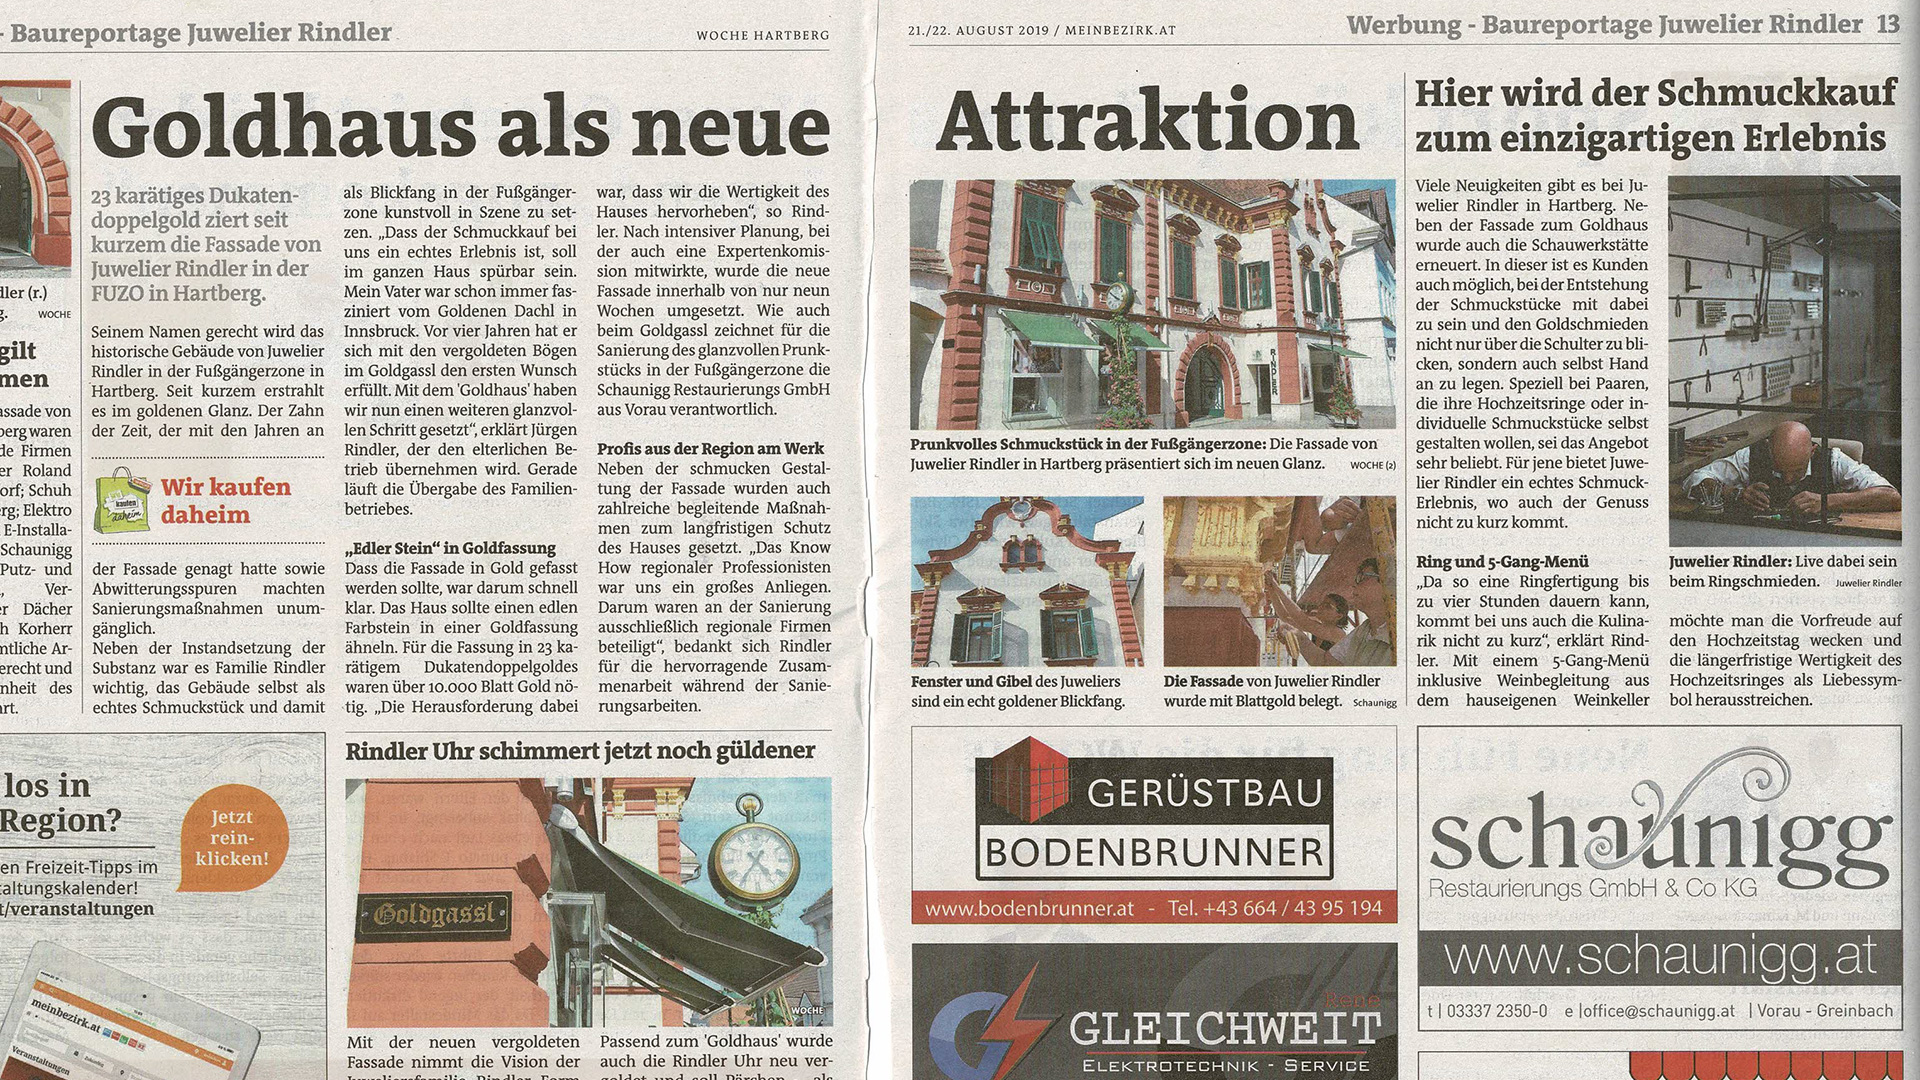 Read more about the article Vergoldung Fassade Juwelier Rindler Baureportage – Hartberger Woche